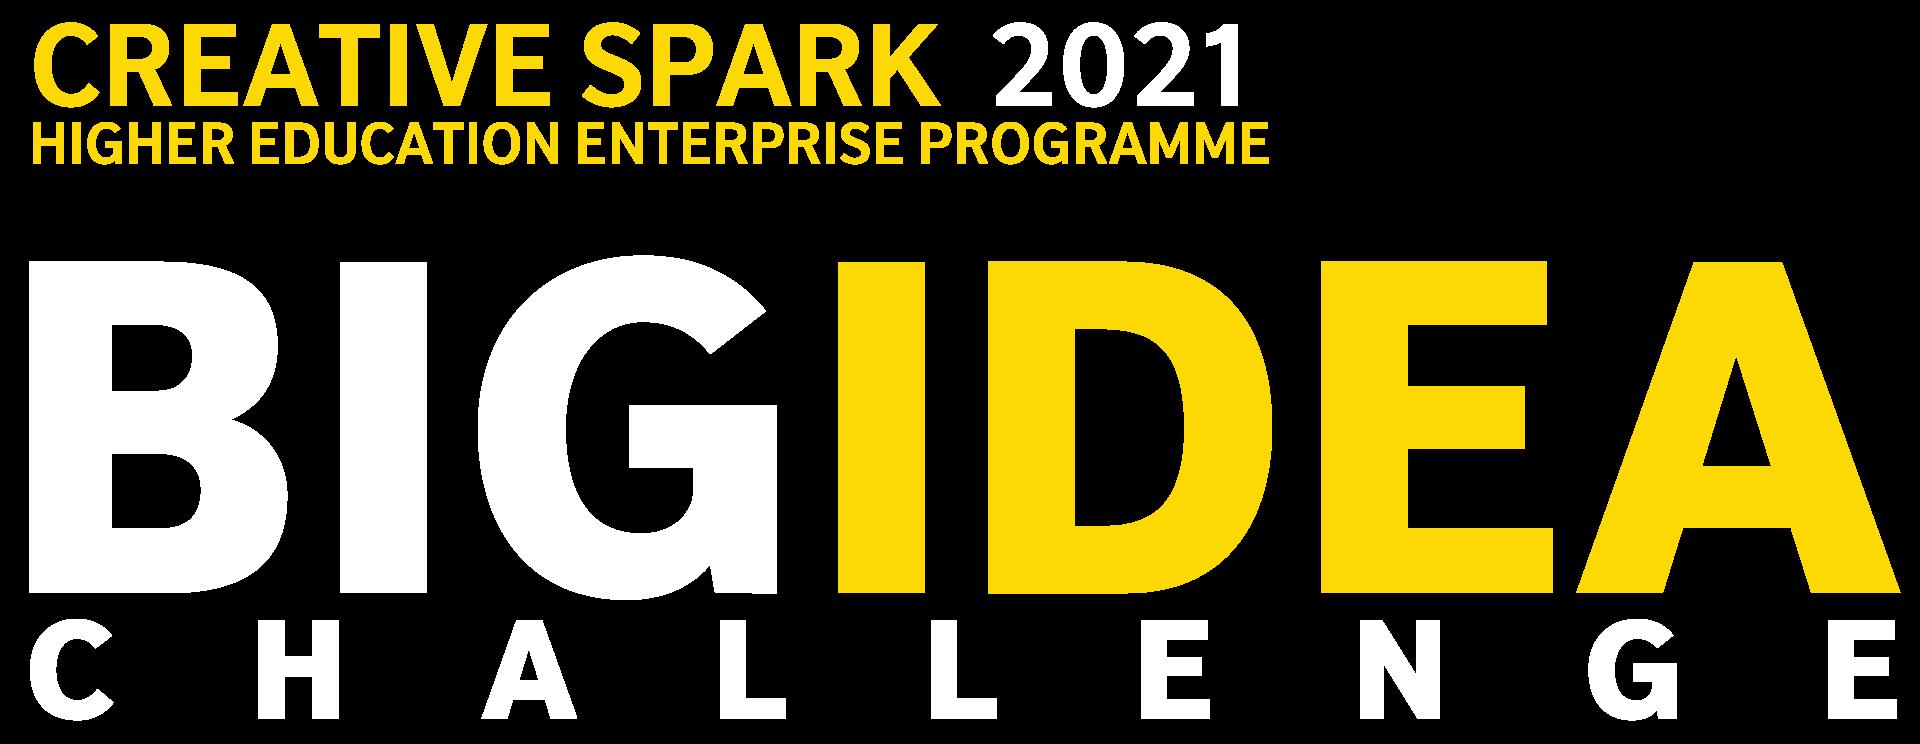 csbic-2021-logo